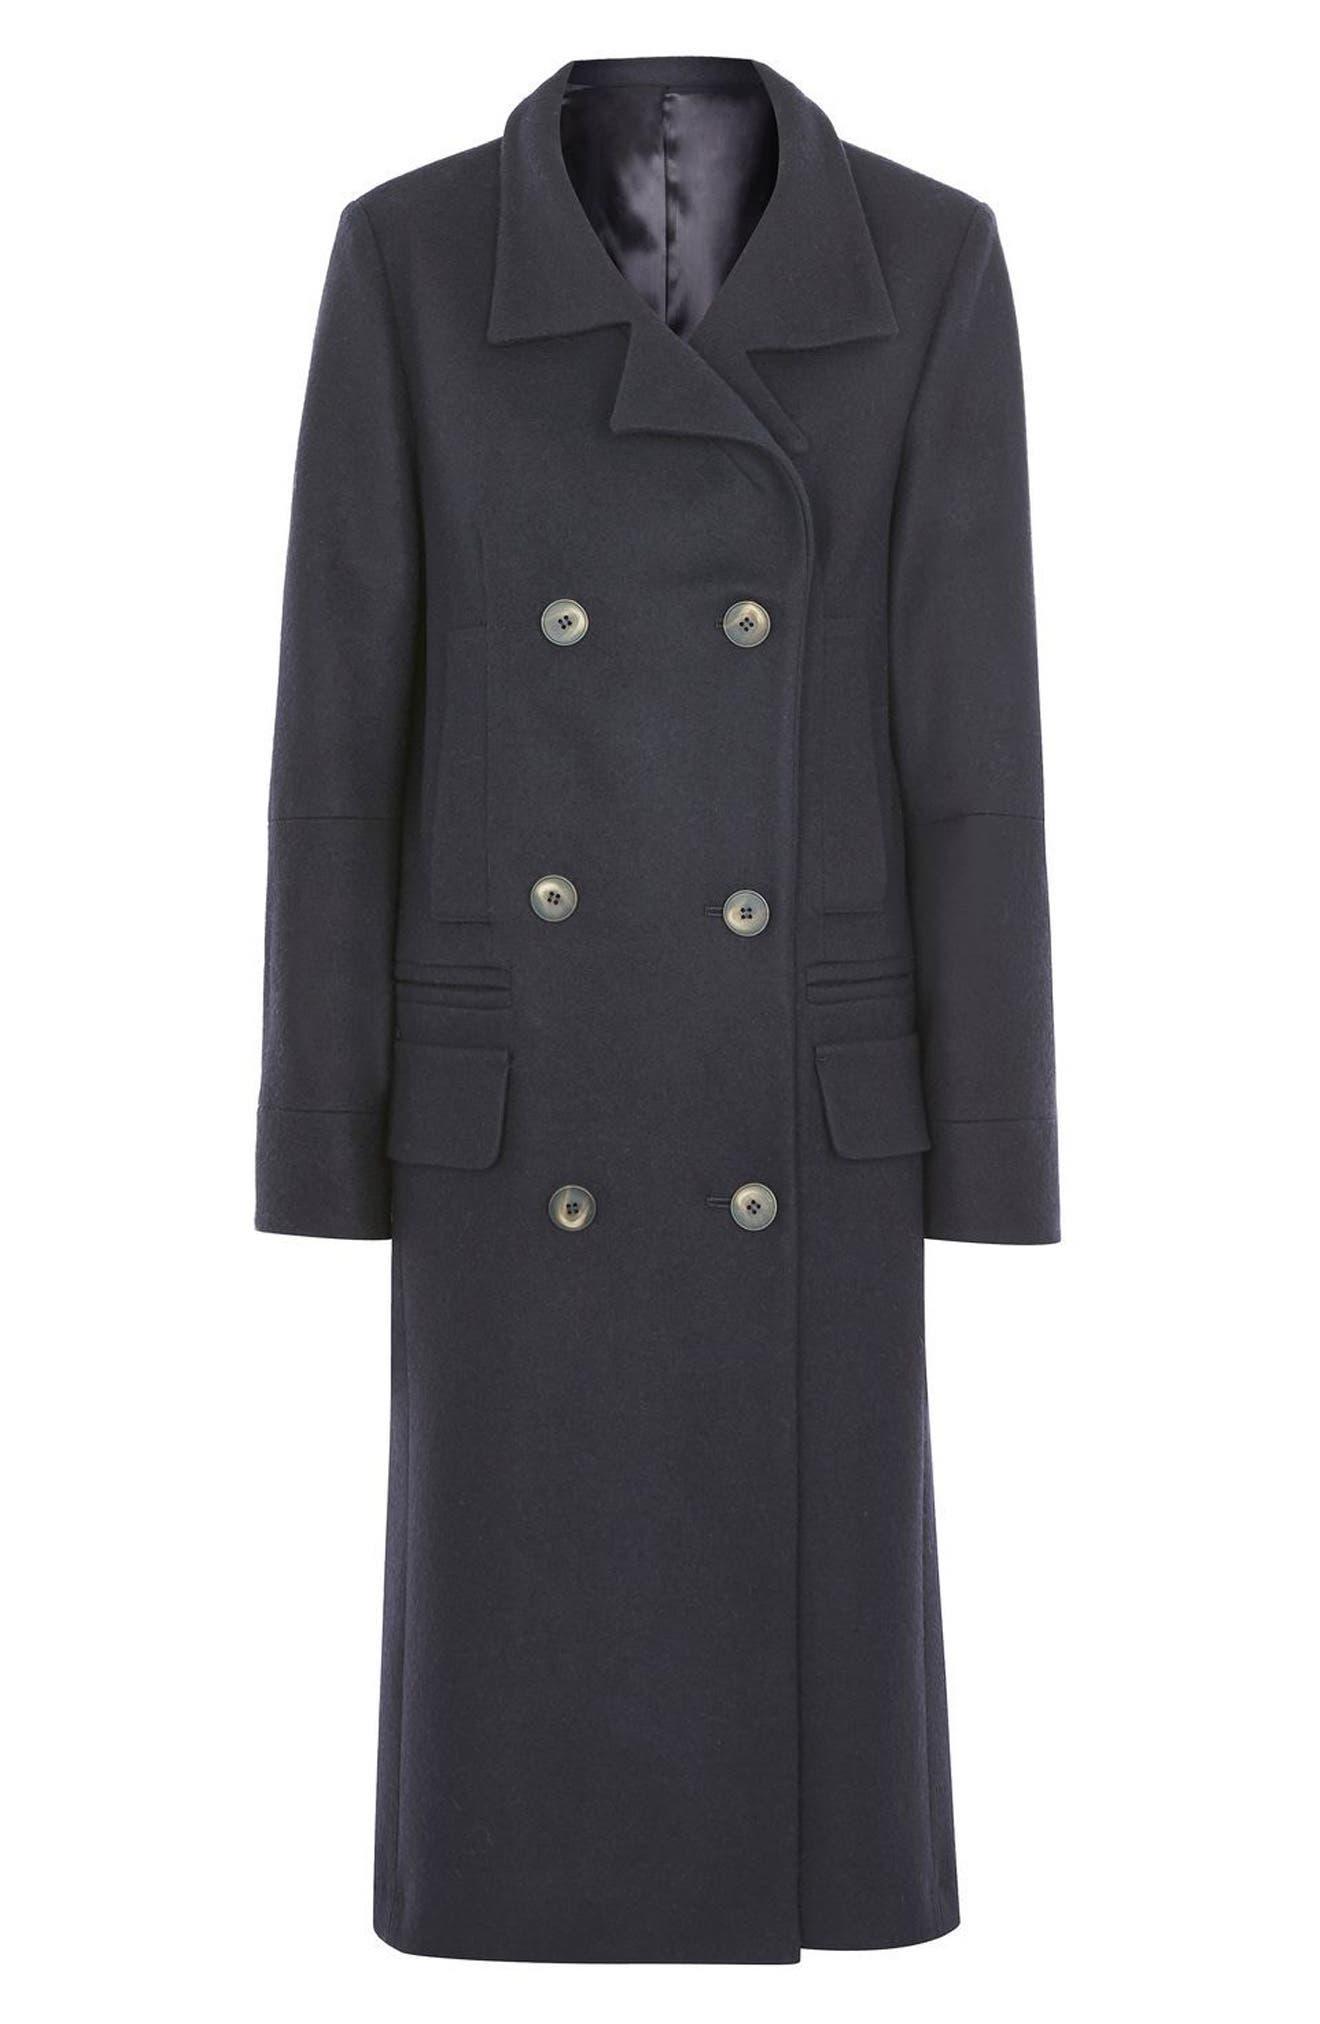 Topshop Unique Double Breasted Coat